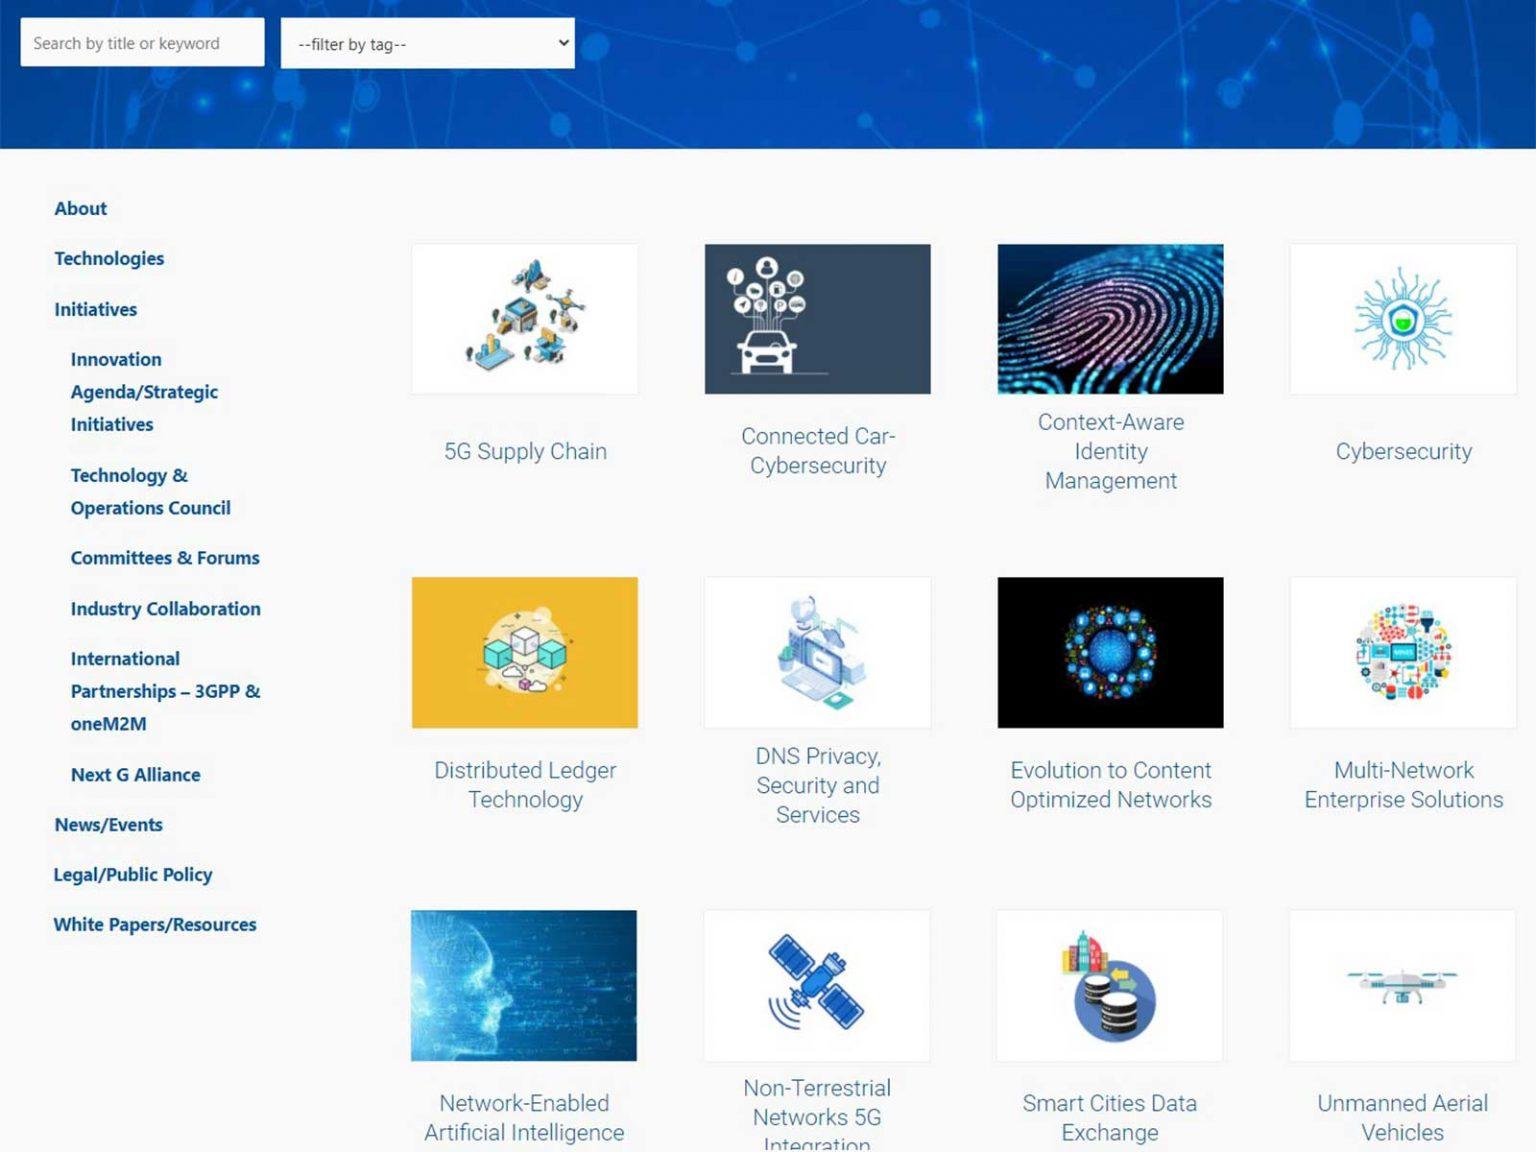 Innovation Agenda / Strategic Initiatives page